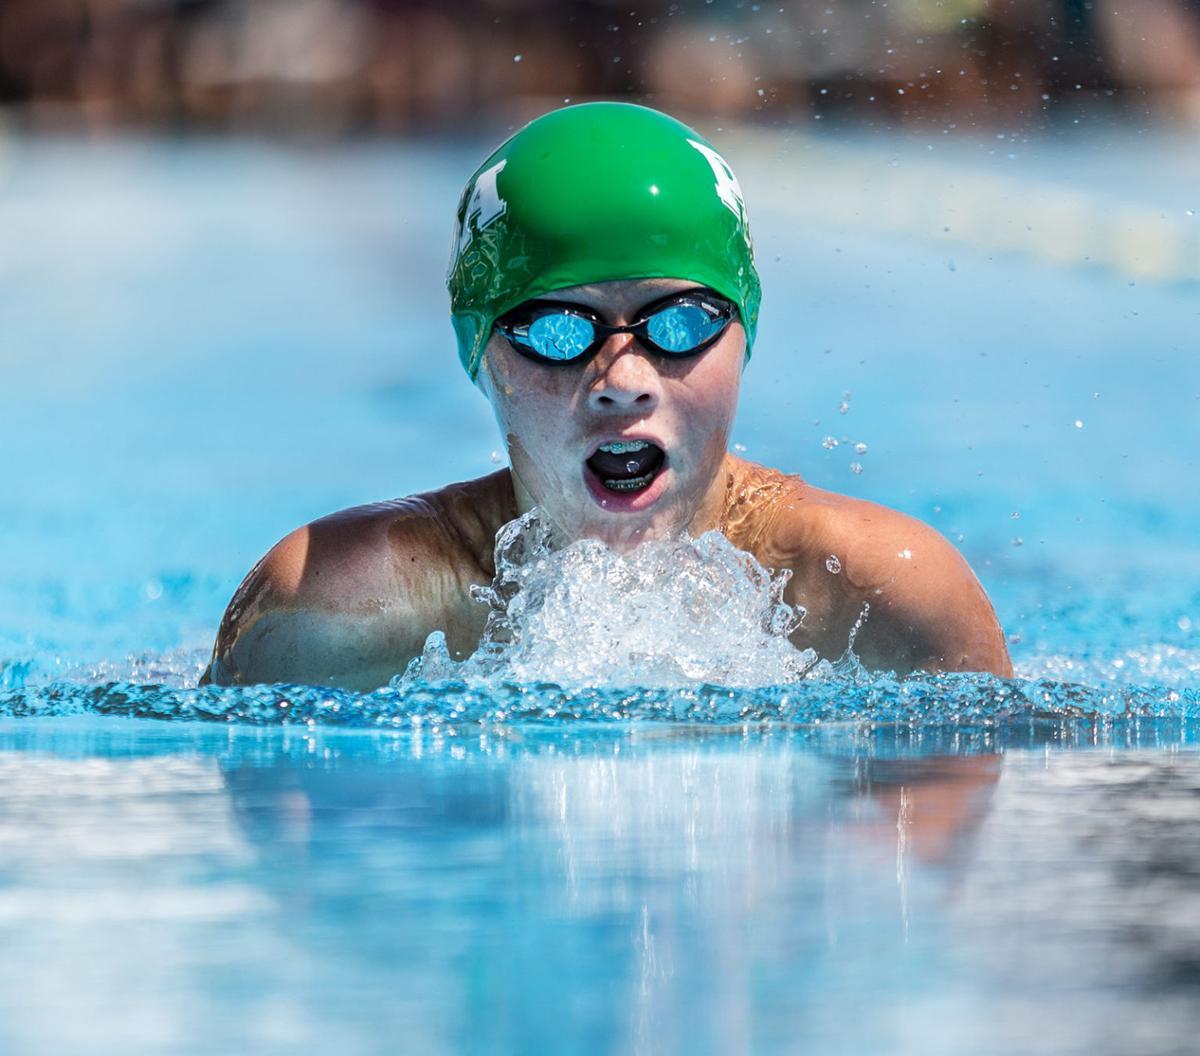 Championship swim meet comes to Pendleton